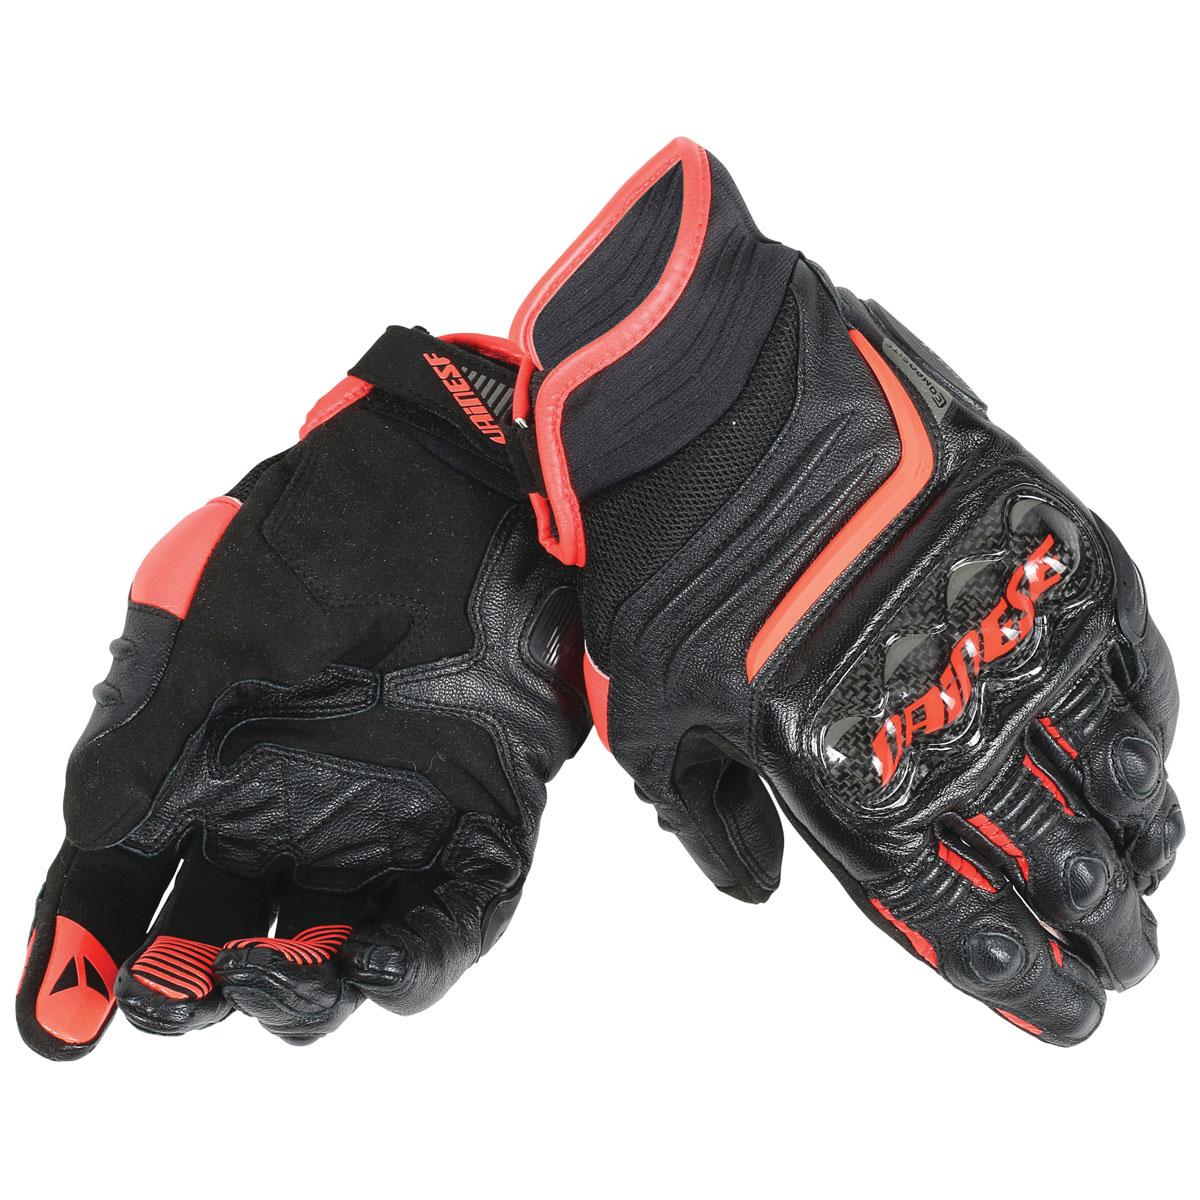 Dainese Men's Carbon D1 Short Black/Fluo Red Gloves